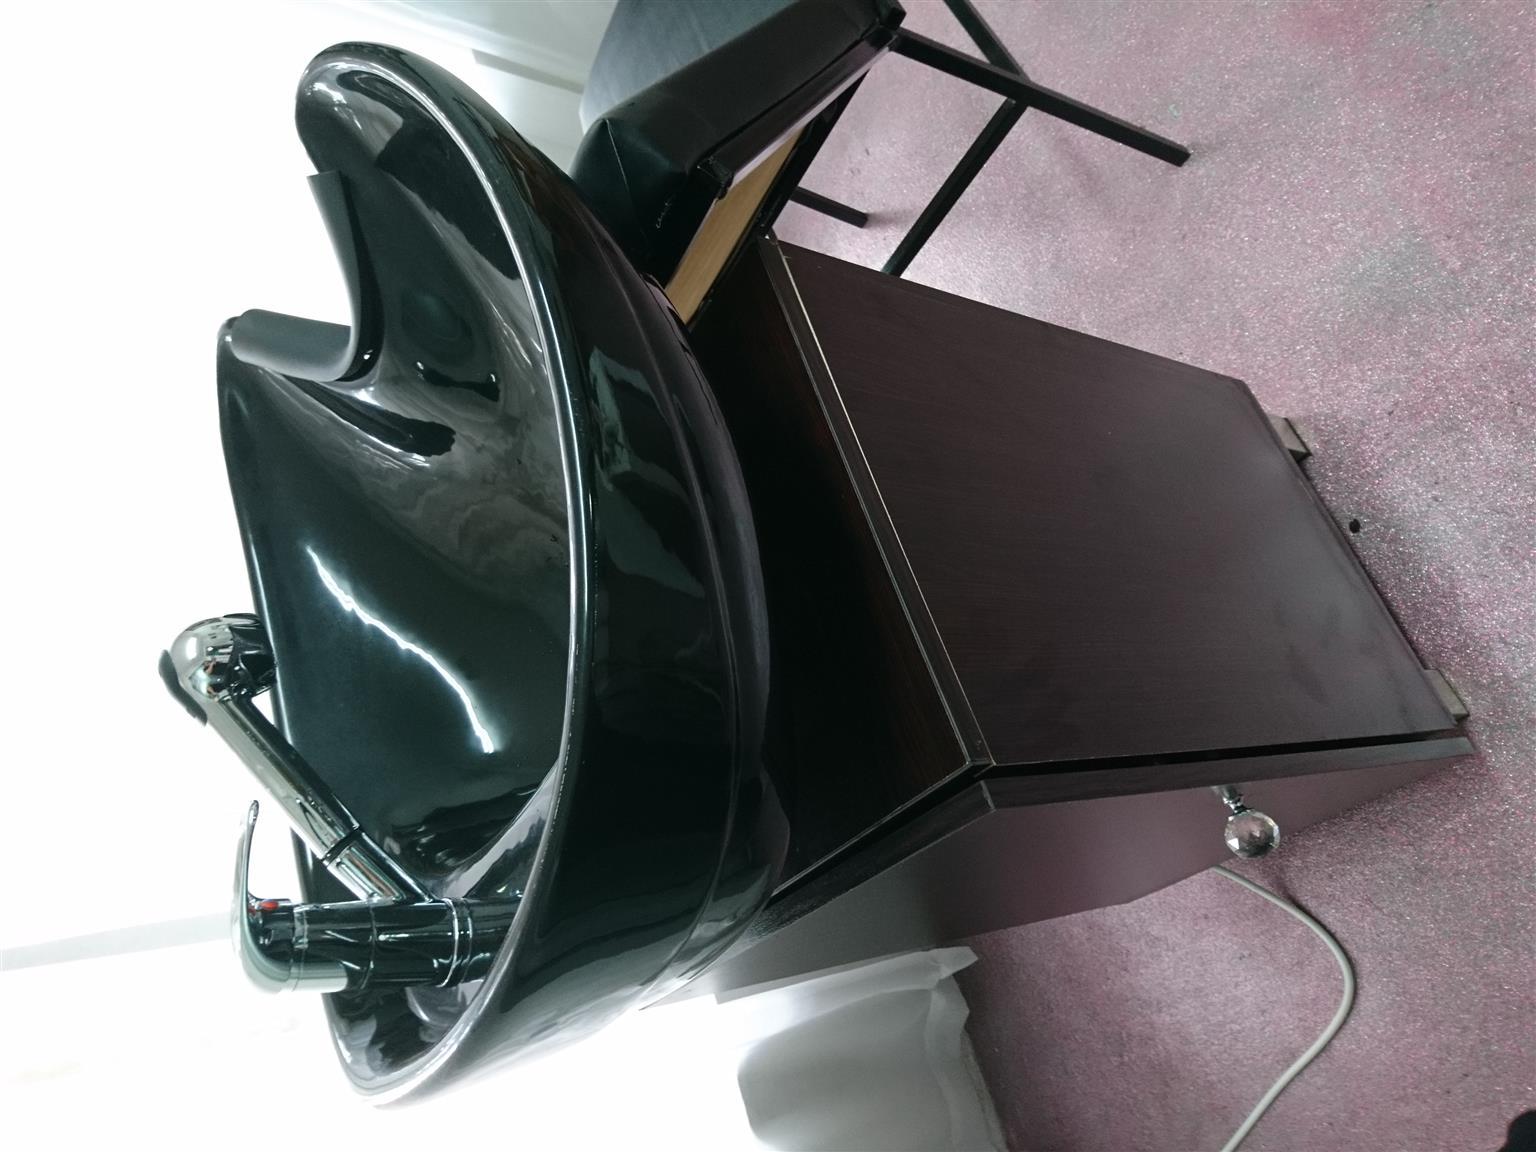 Salon Basin and chair